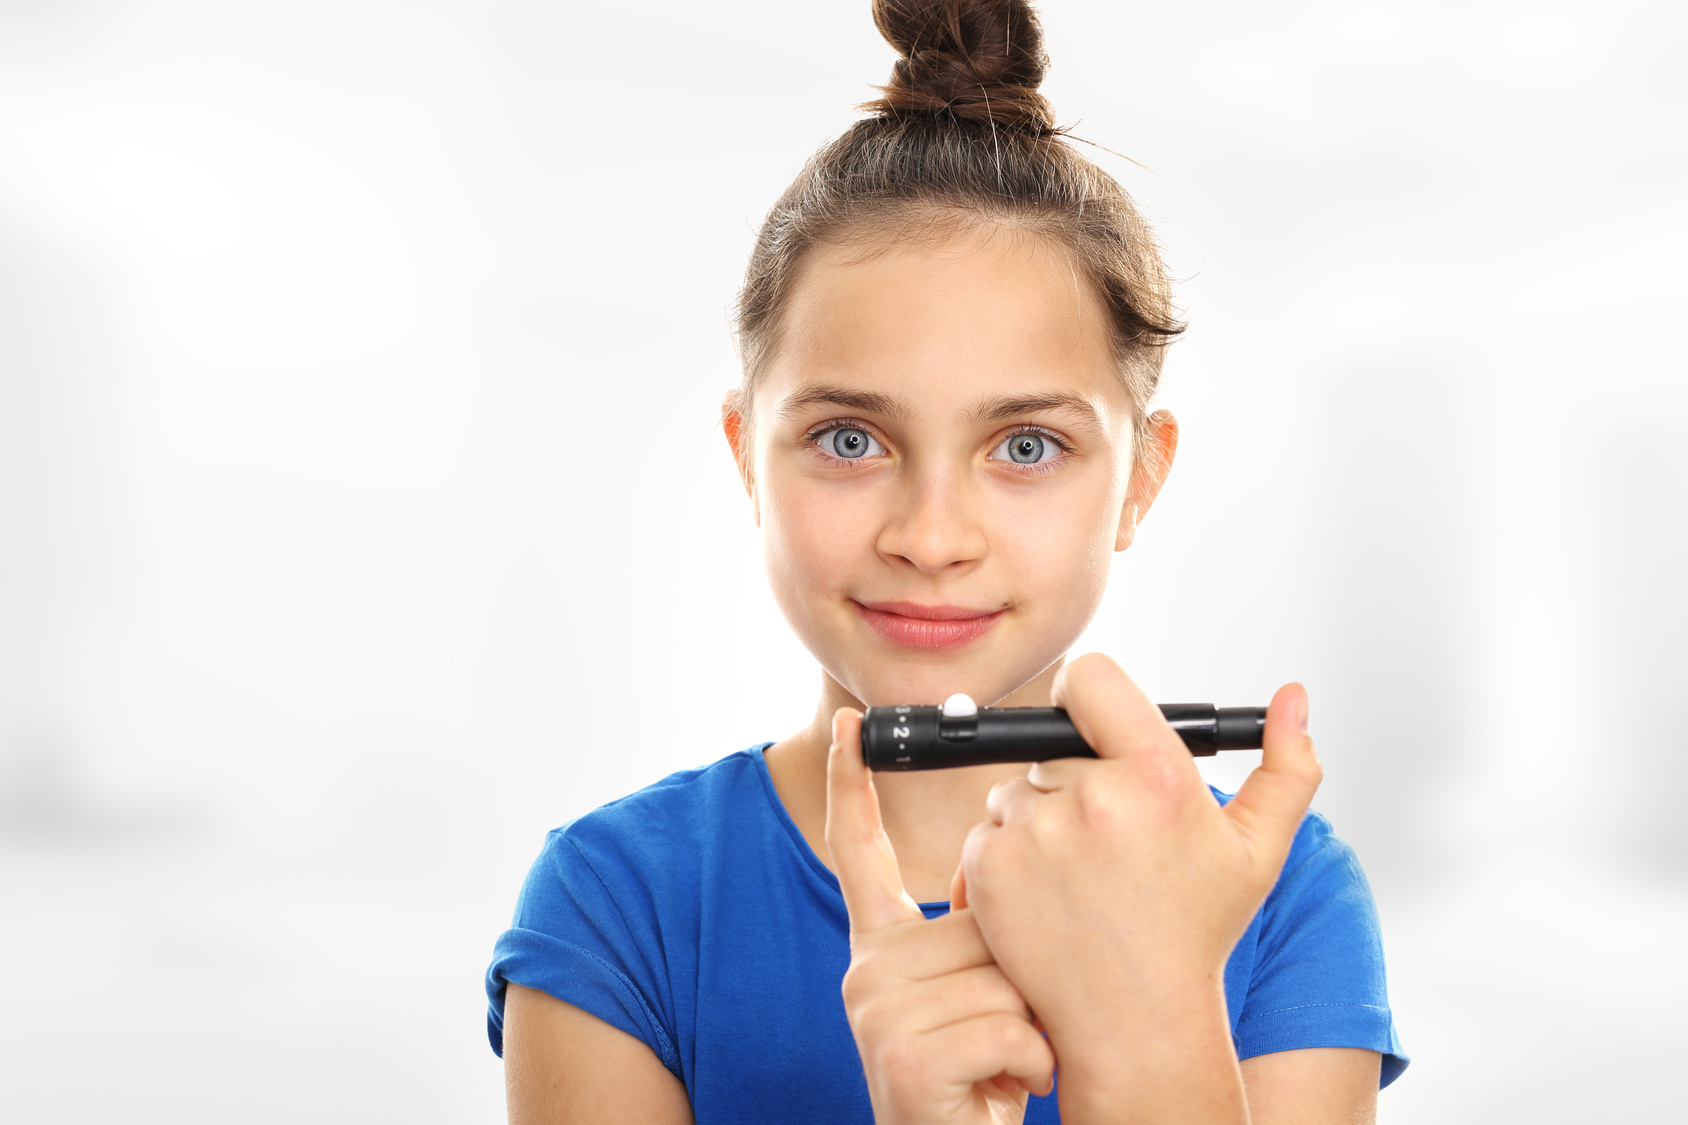 Girl with Diabetes